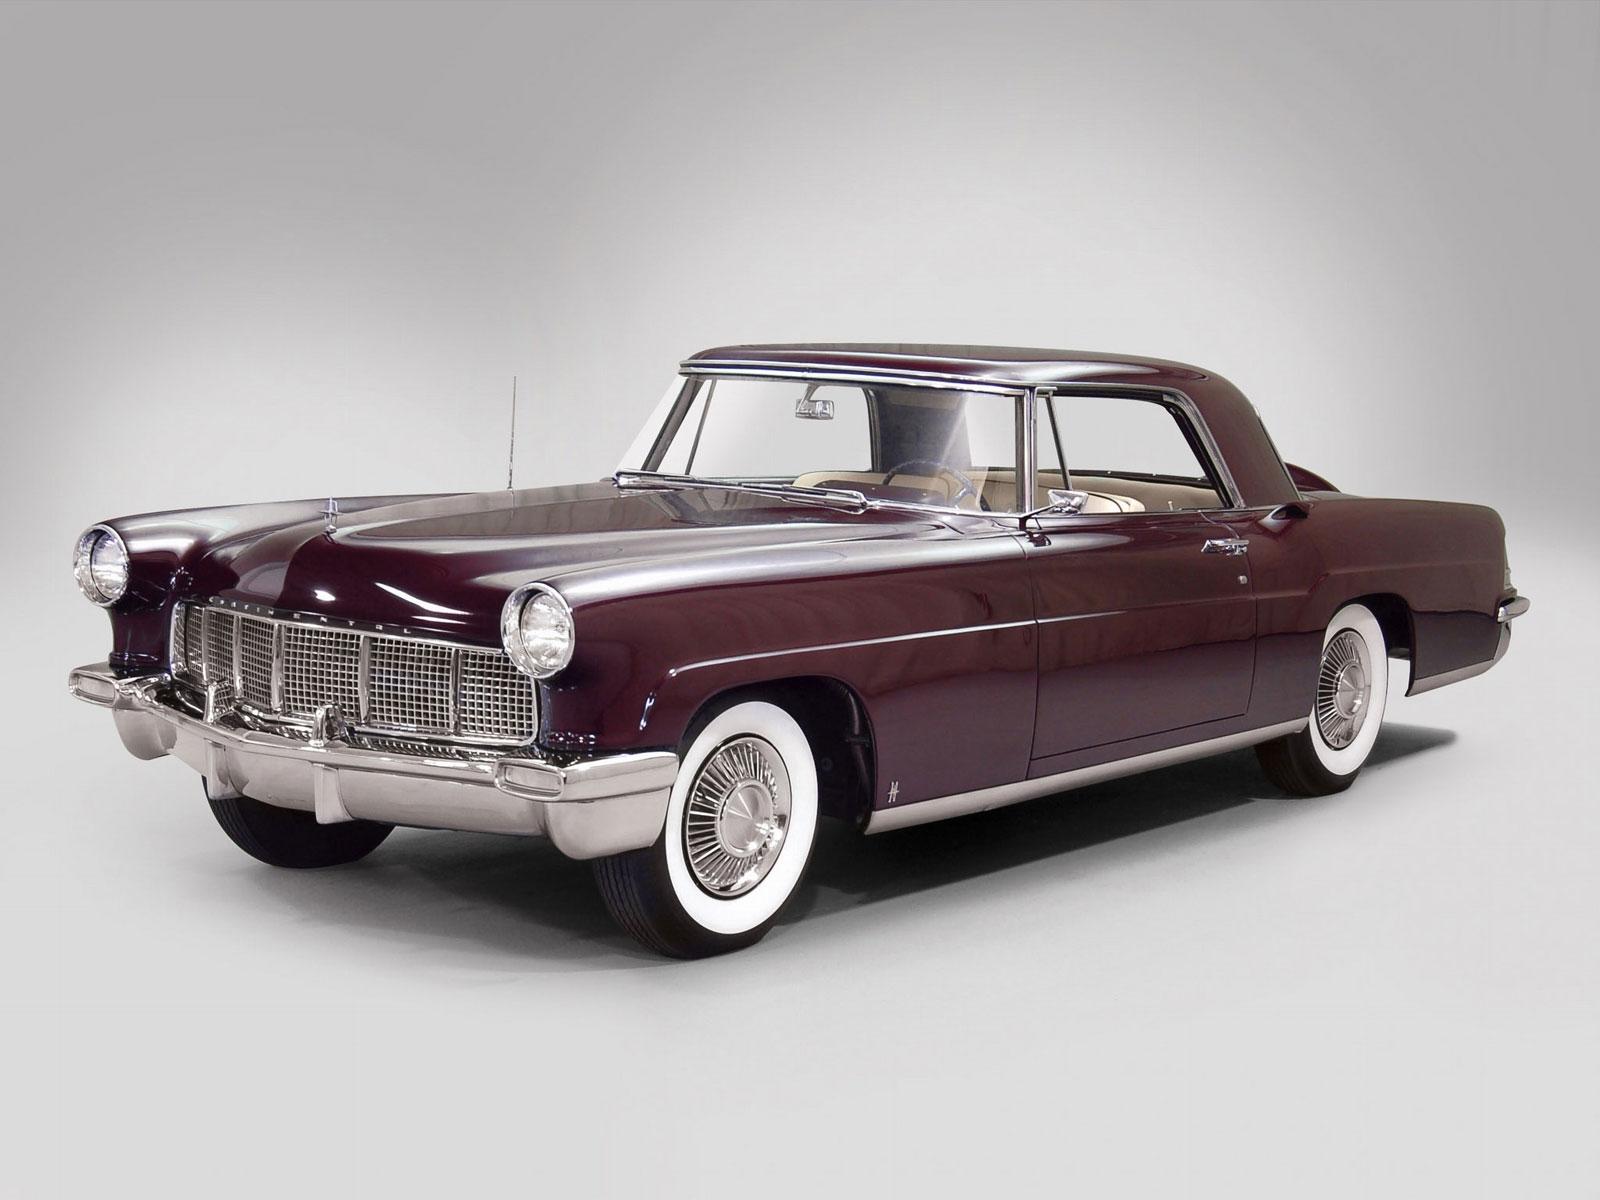 1956 57 lincoln continental mark ii car body design. Black Bedroom Furniture Sets. Home Design Ideas